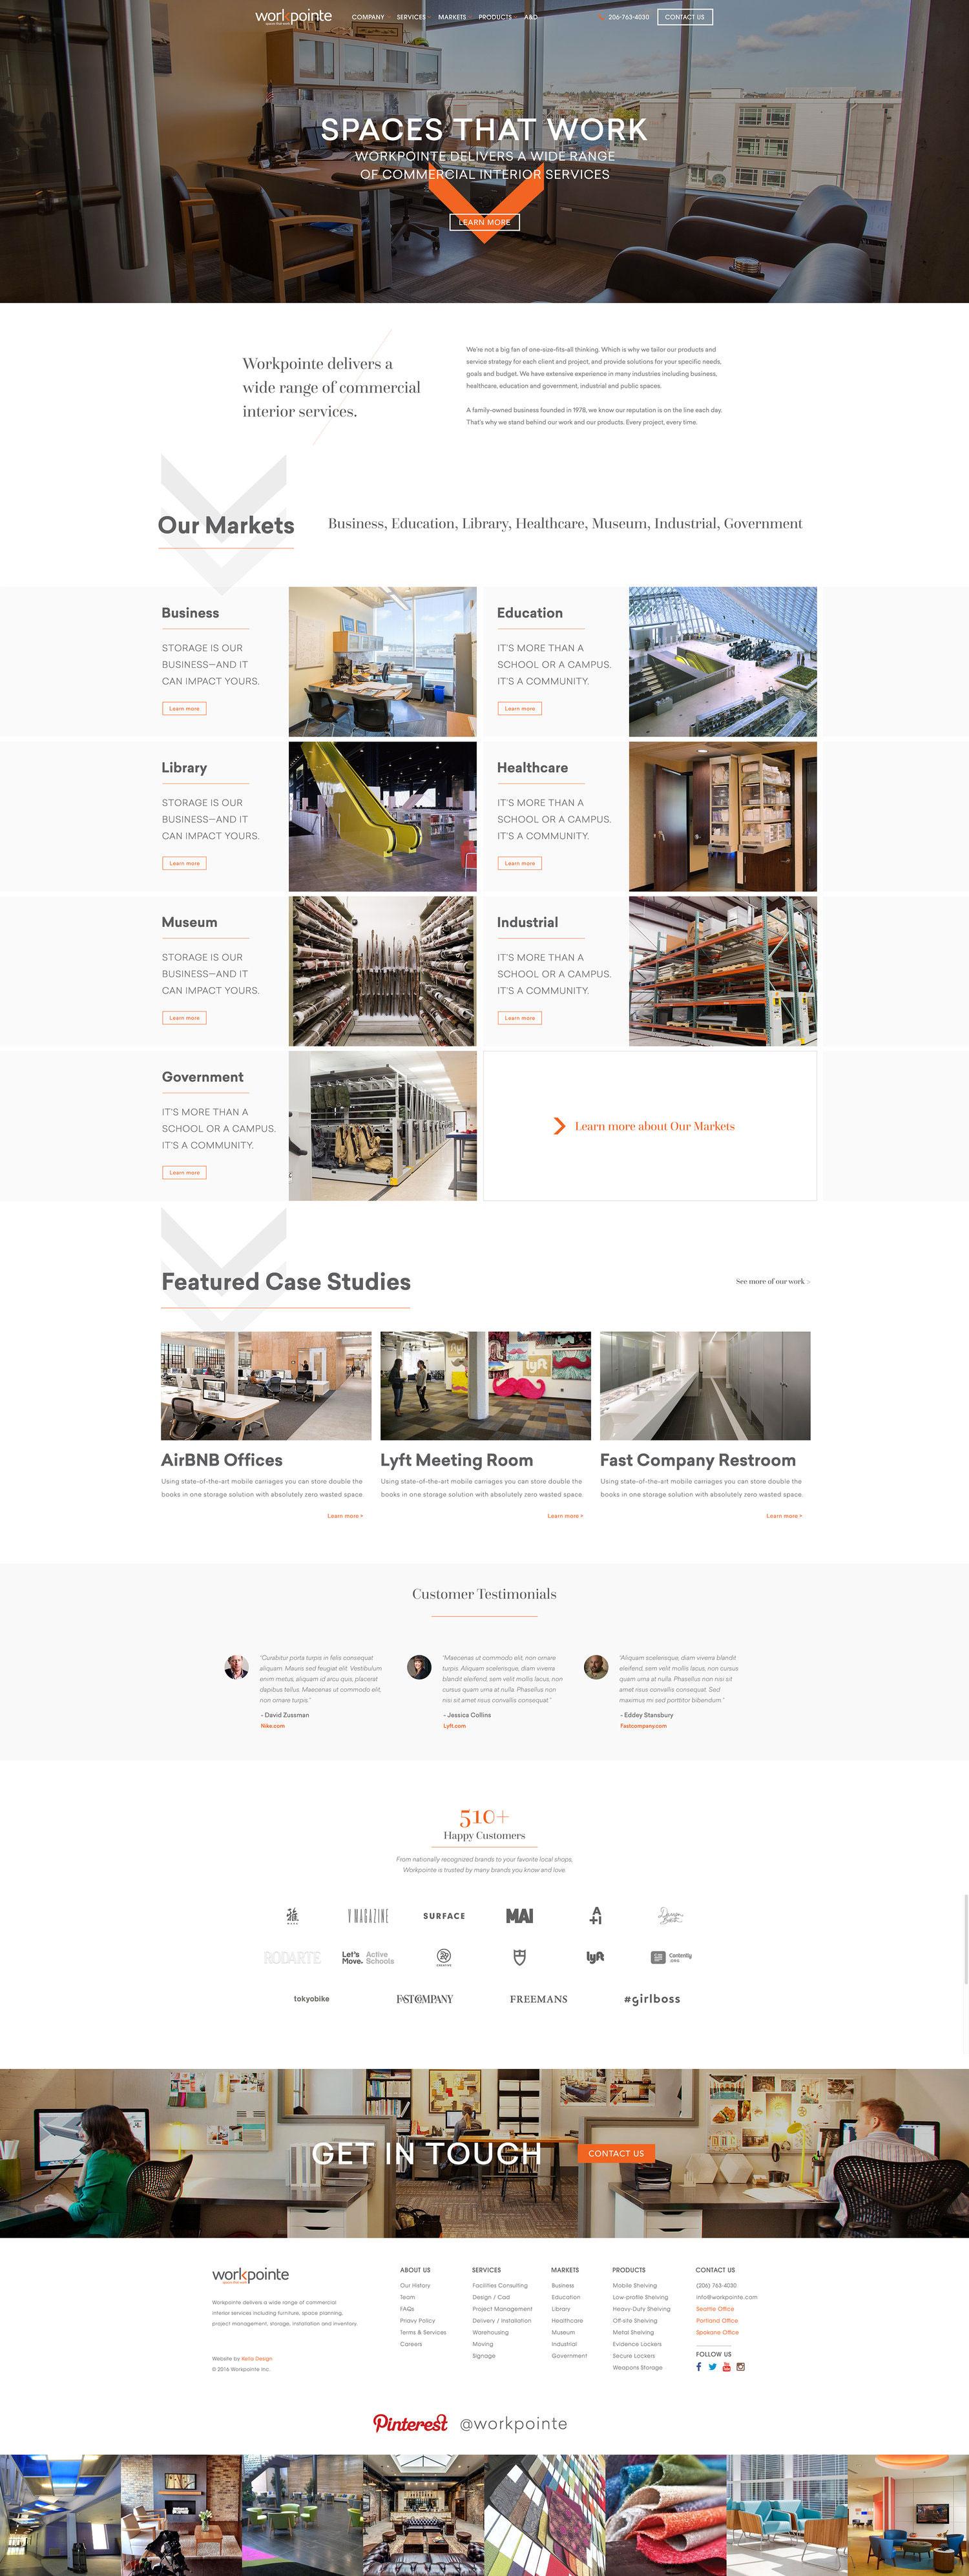 Web Design | Workpointe - Homepage | V2 (Desktop View)